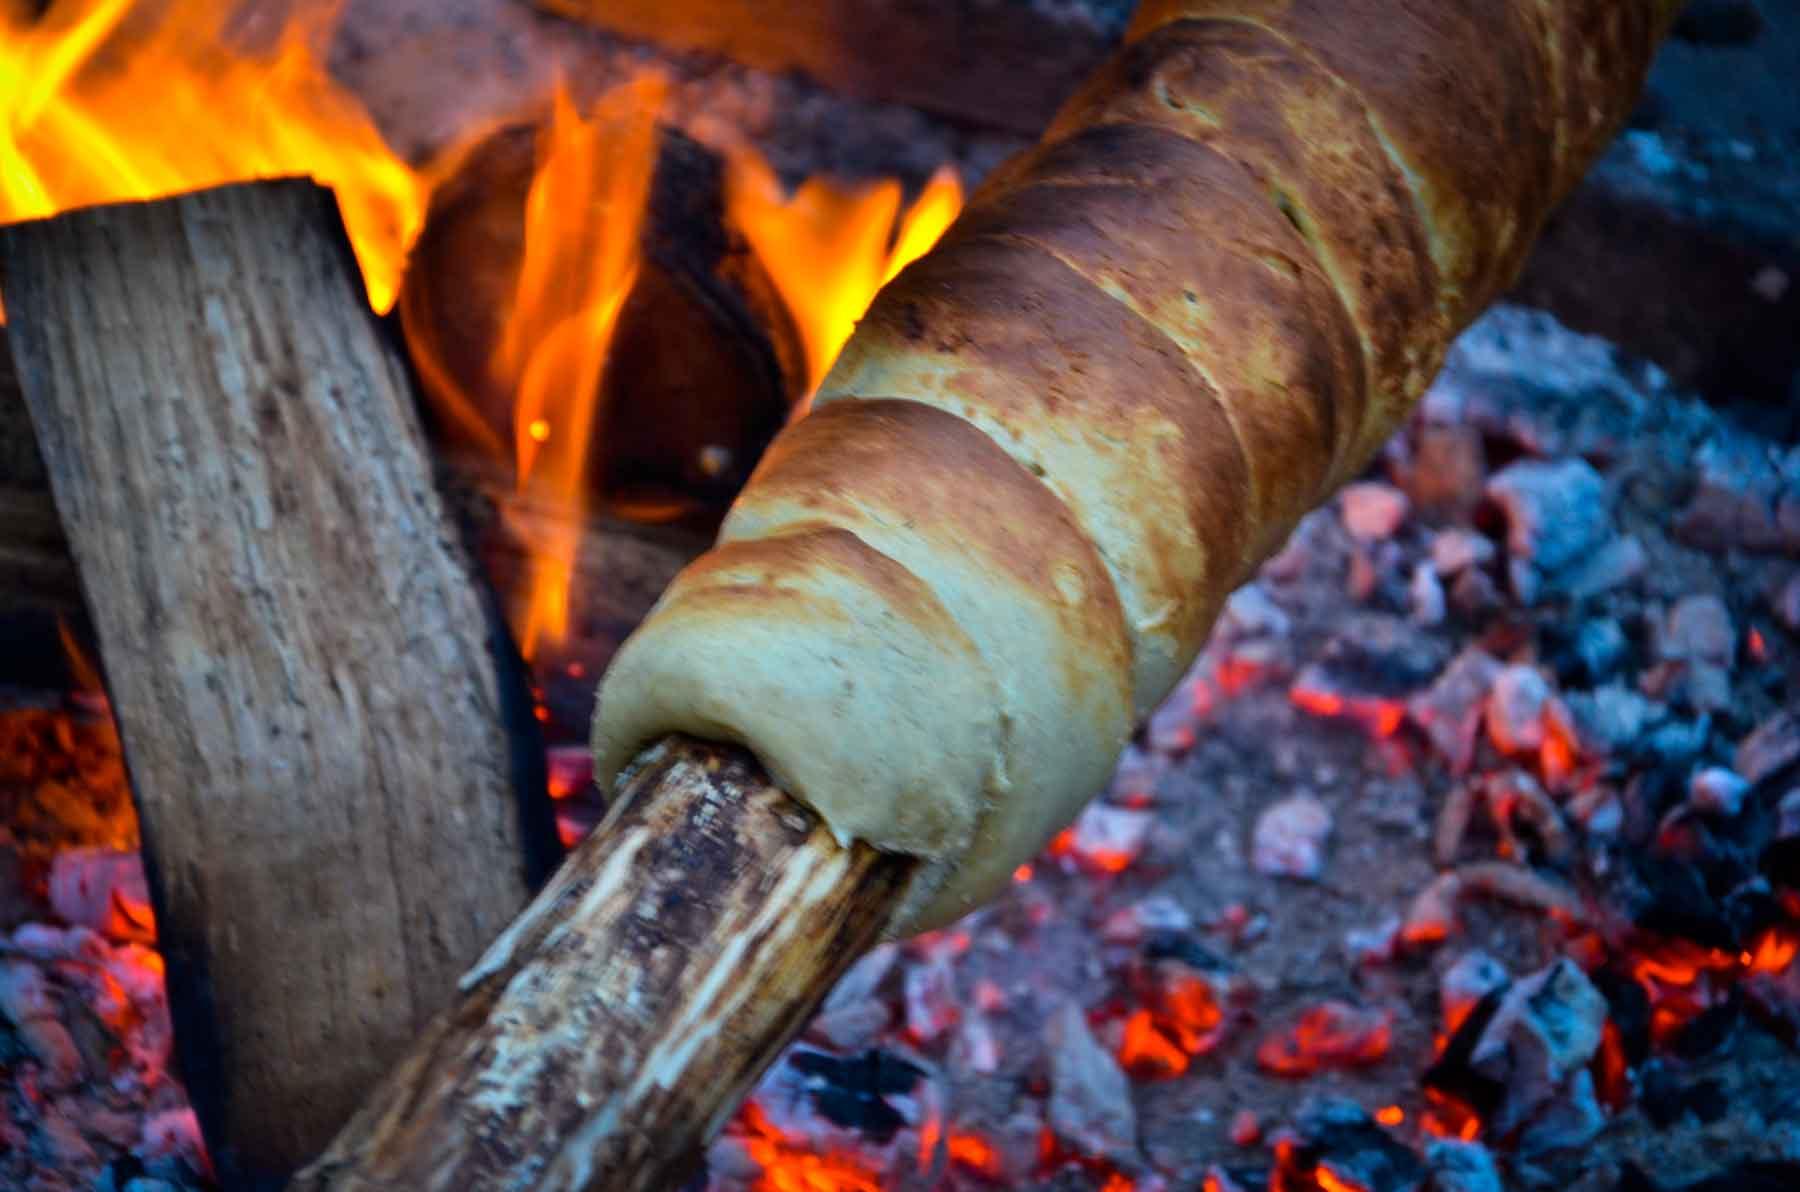 Lagerfeuer Kochen Baumstriezel